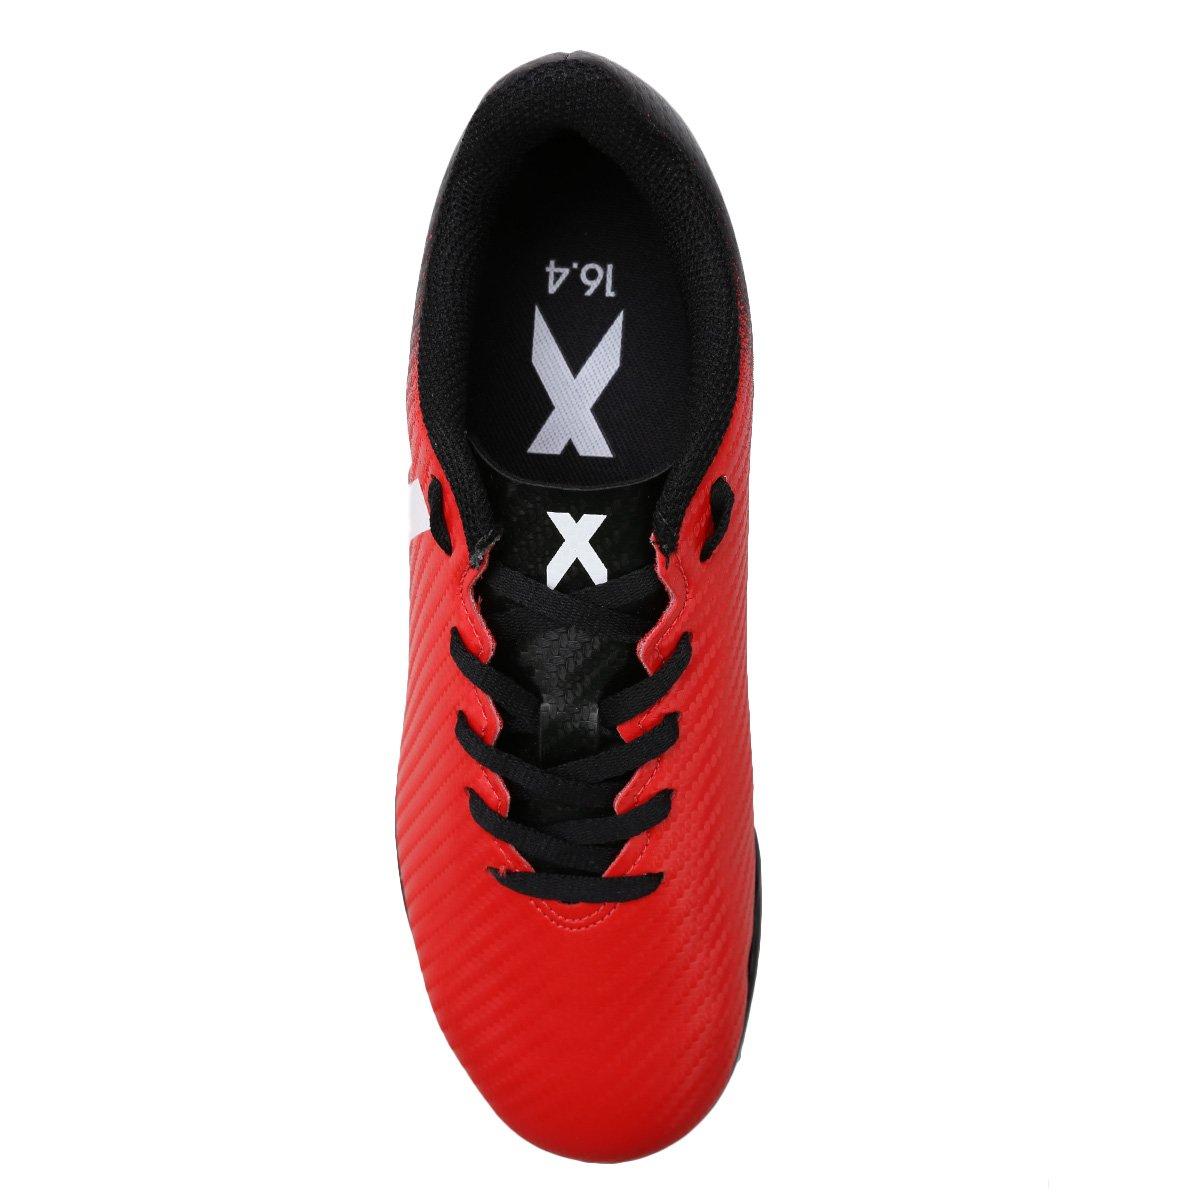 620f9e25aa Chuteira Society Infantil Adidas X 16.4 TF - Compre Agora